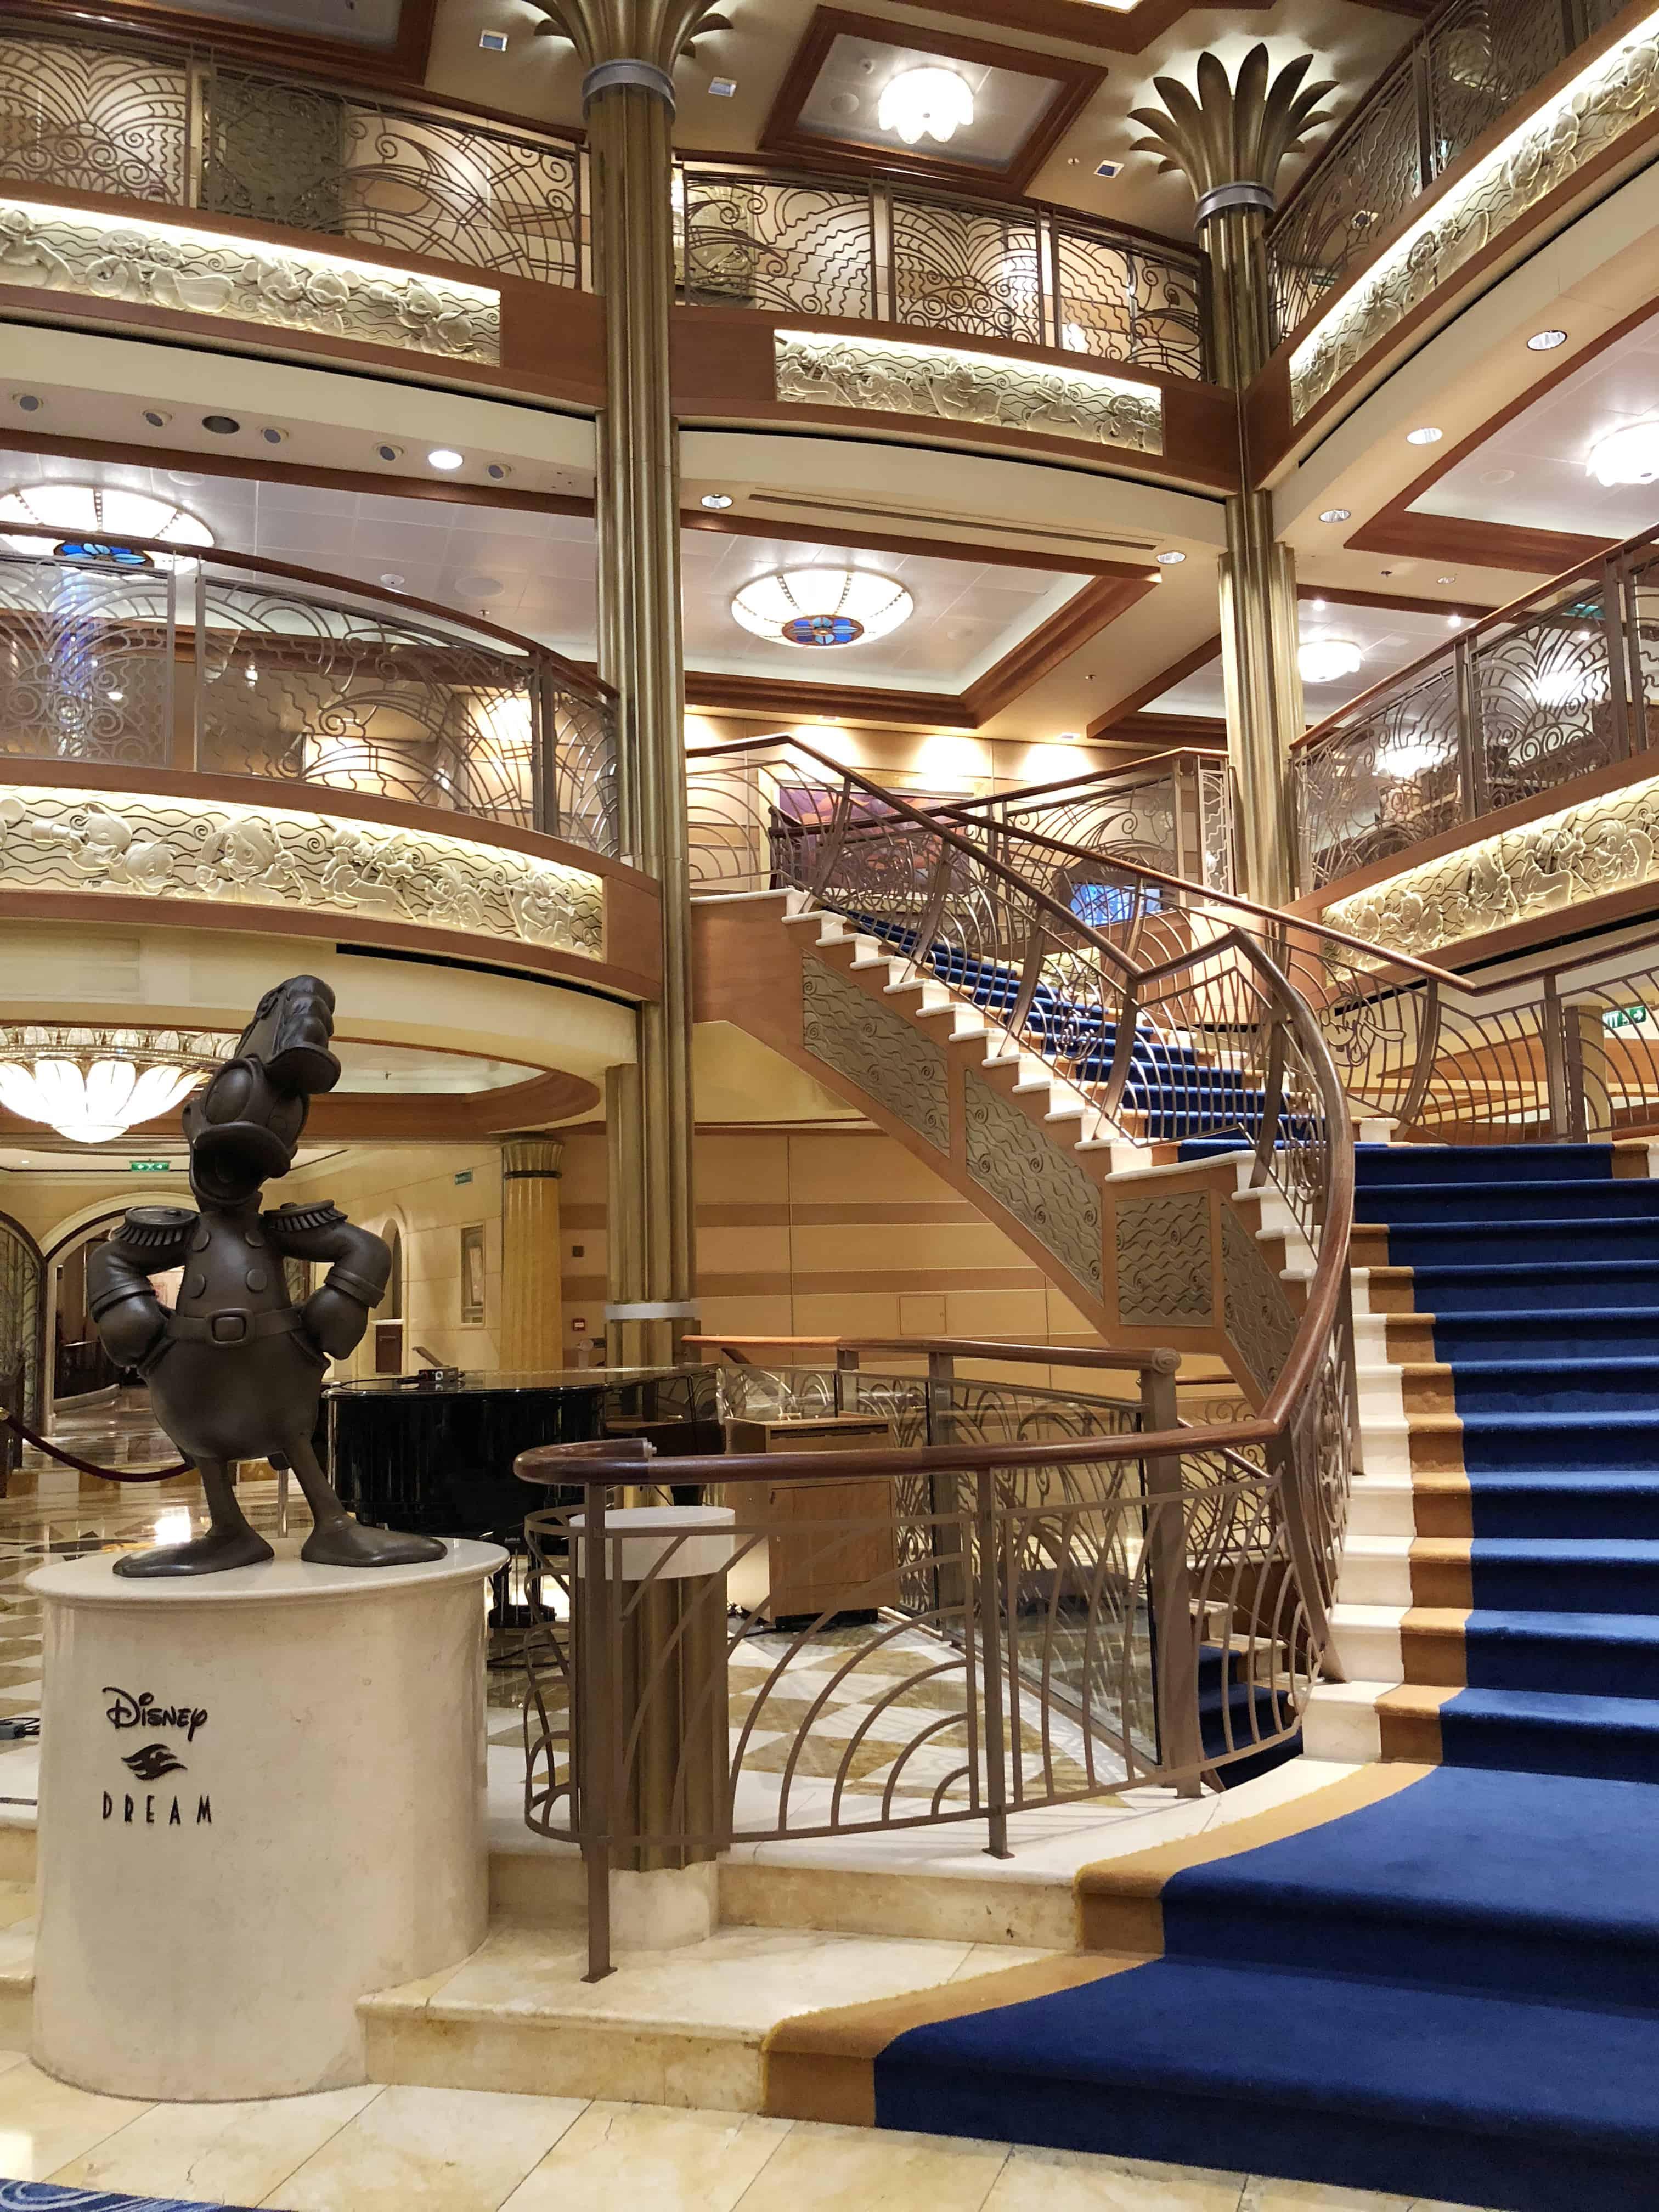 Inside The Disney Dream: Disney Cruise Line {Our Multigenerational Dream Cruise